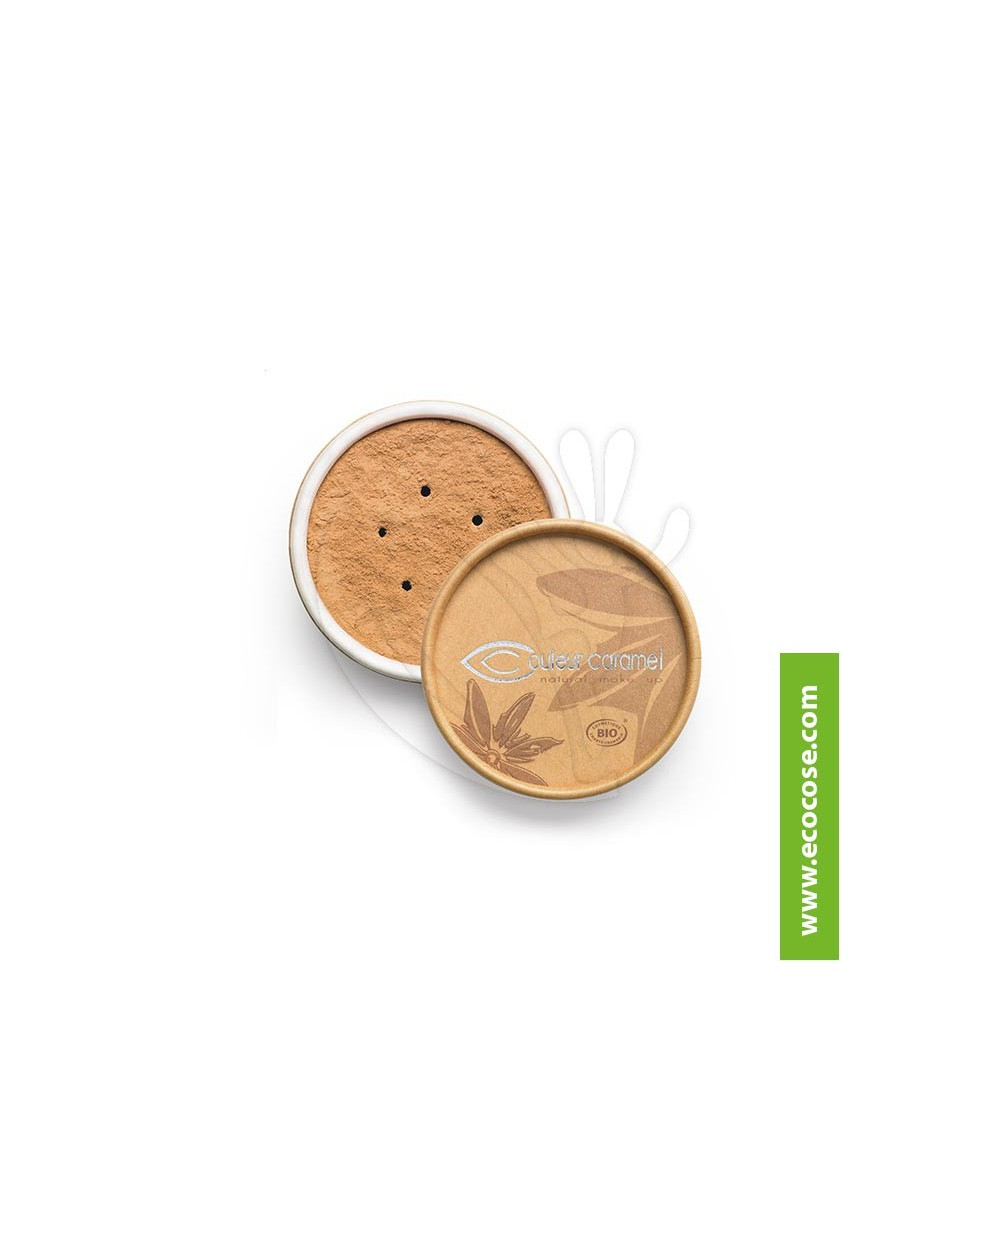 Couleur Caramel - Fondotinta minerale 03 Beige abricot